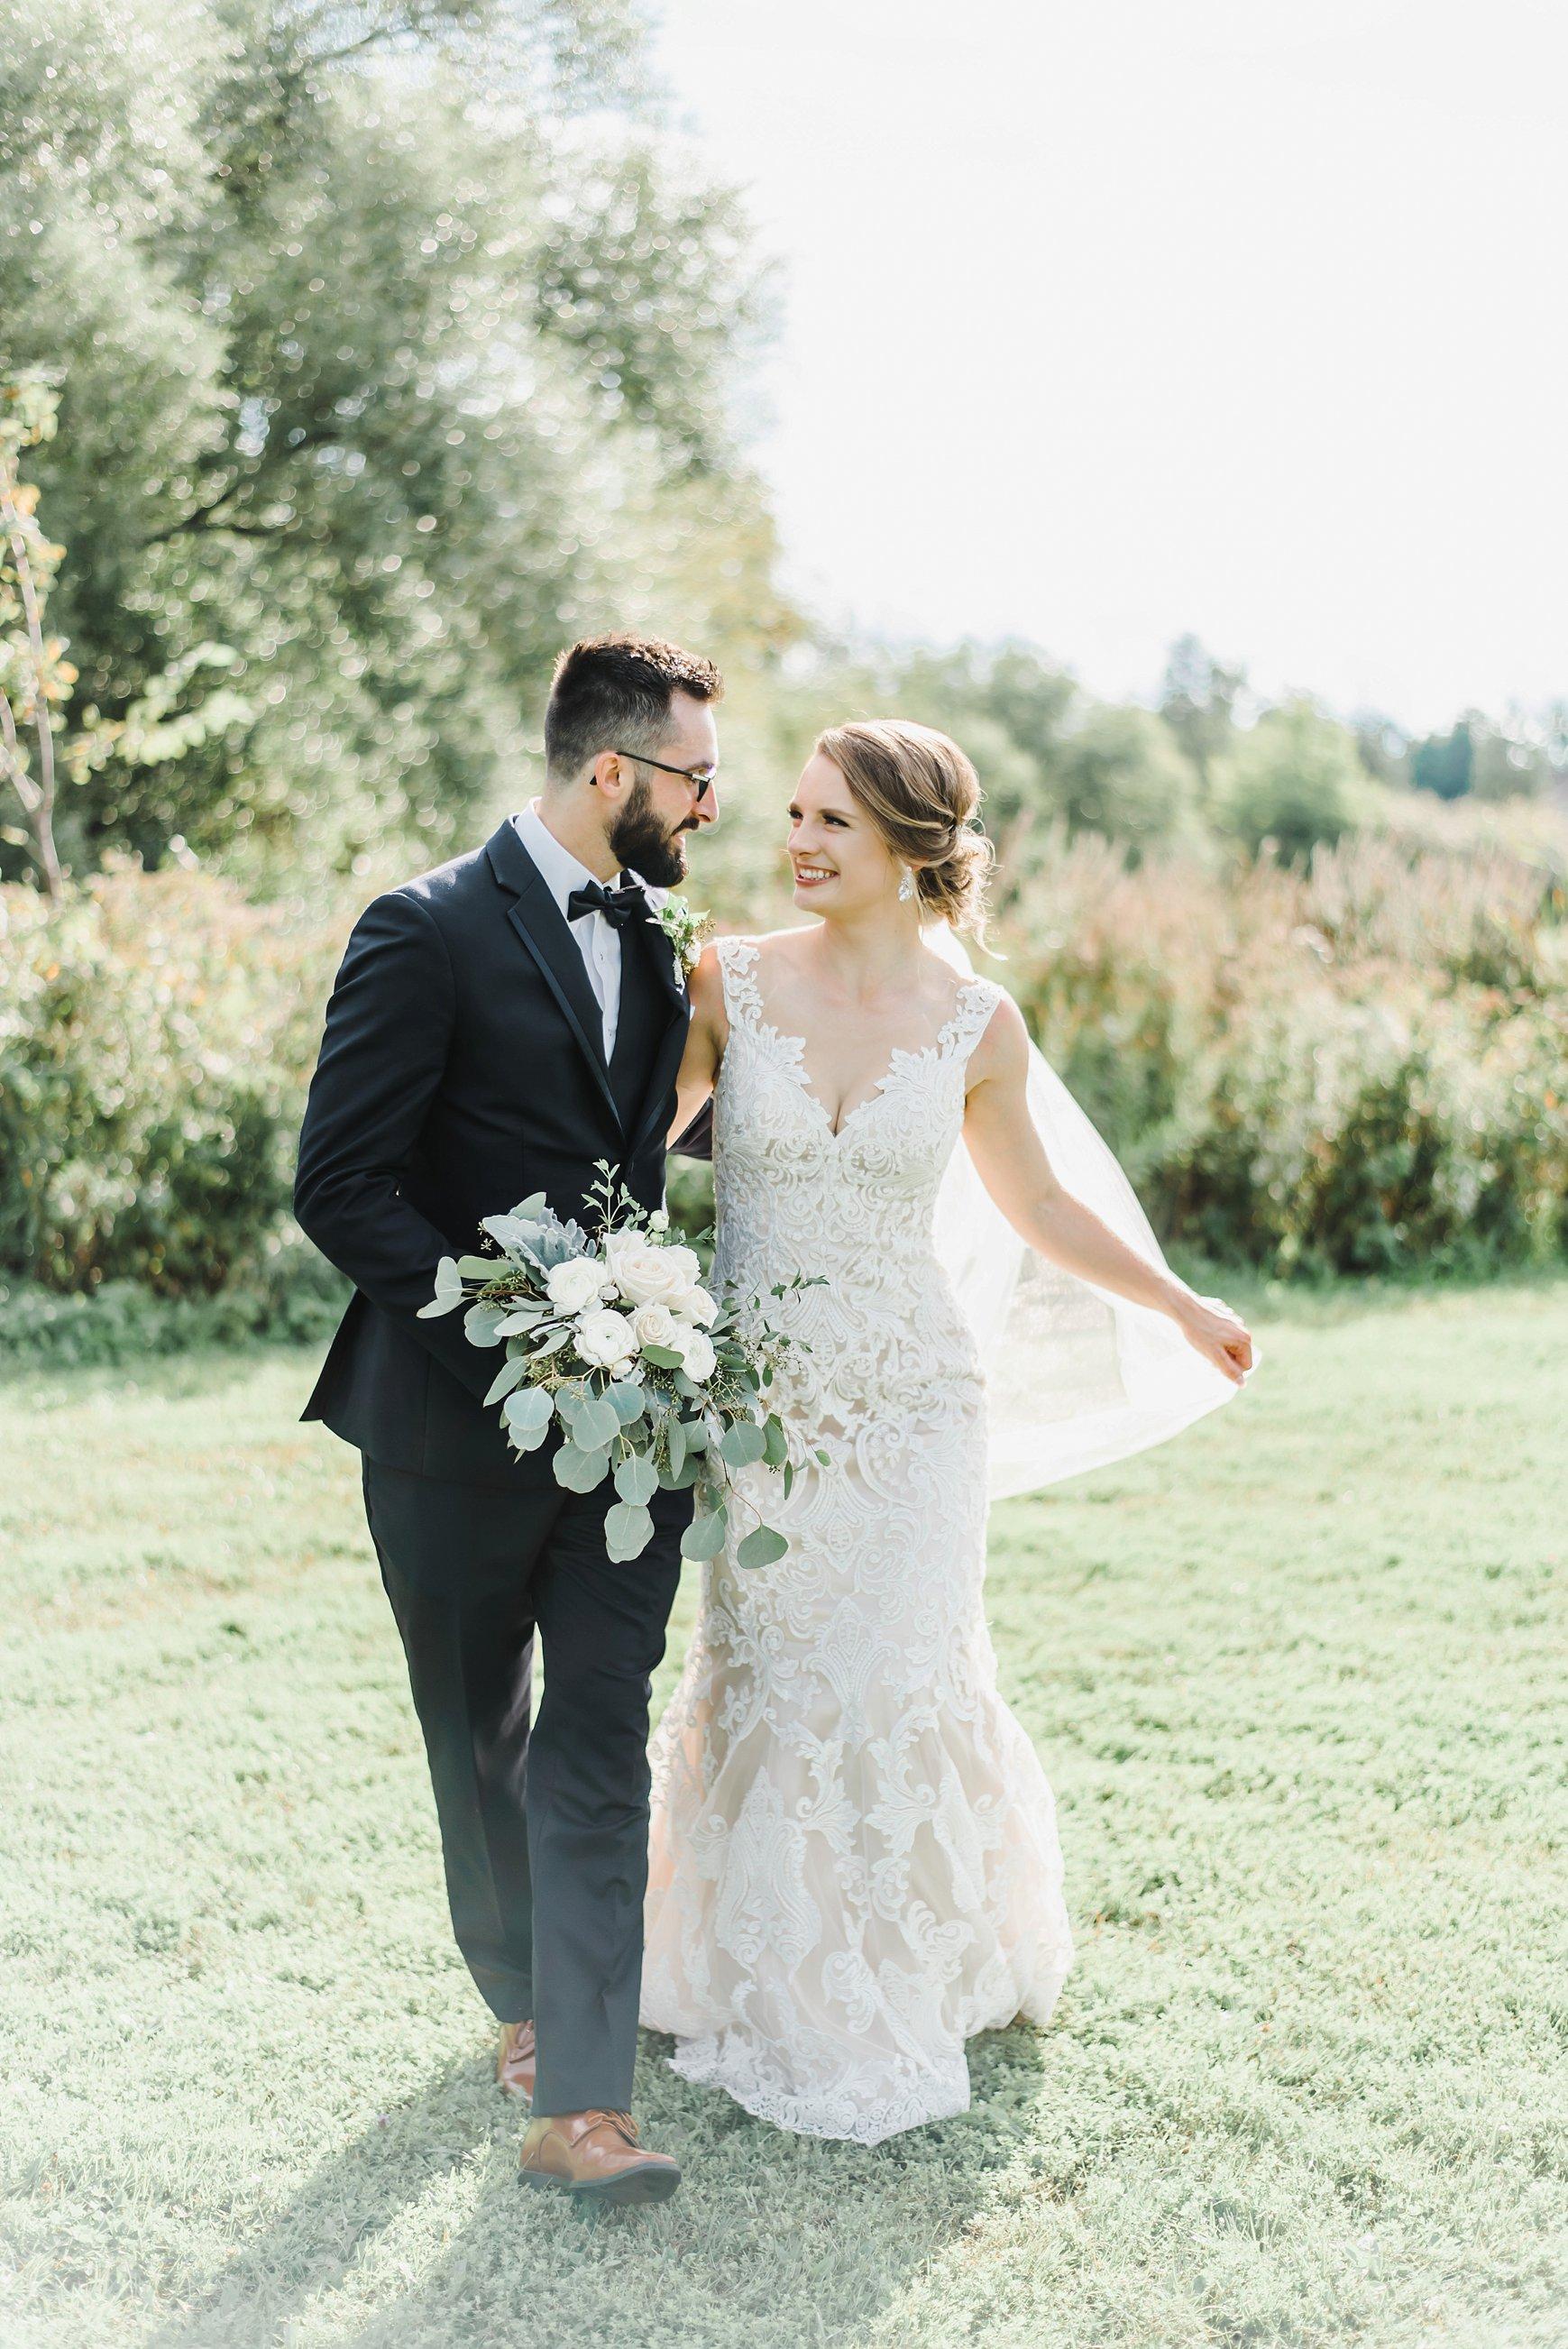 light airy indie fine art ottawa wedding photographer | Ali and Batoul Photography_1321.jpg